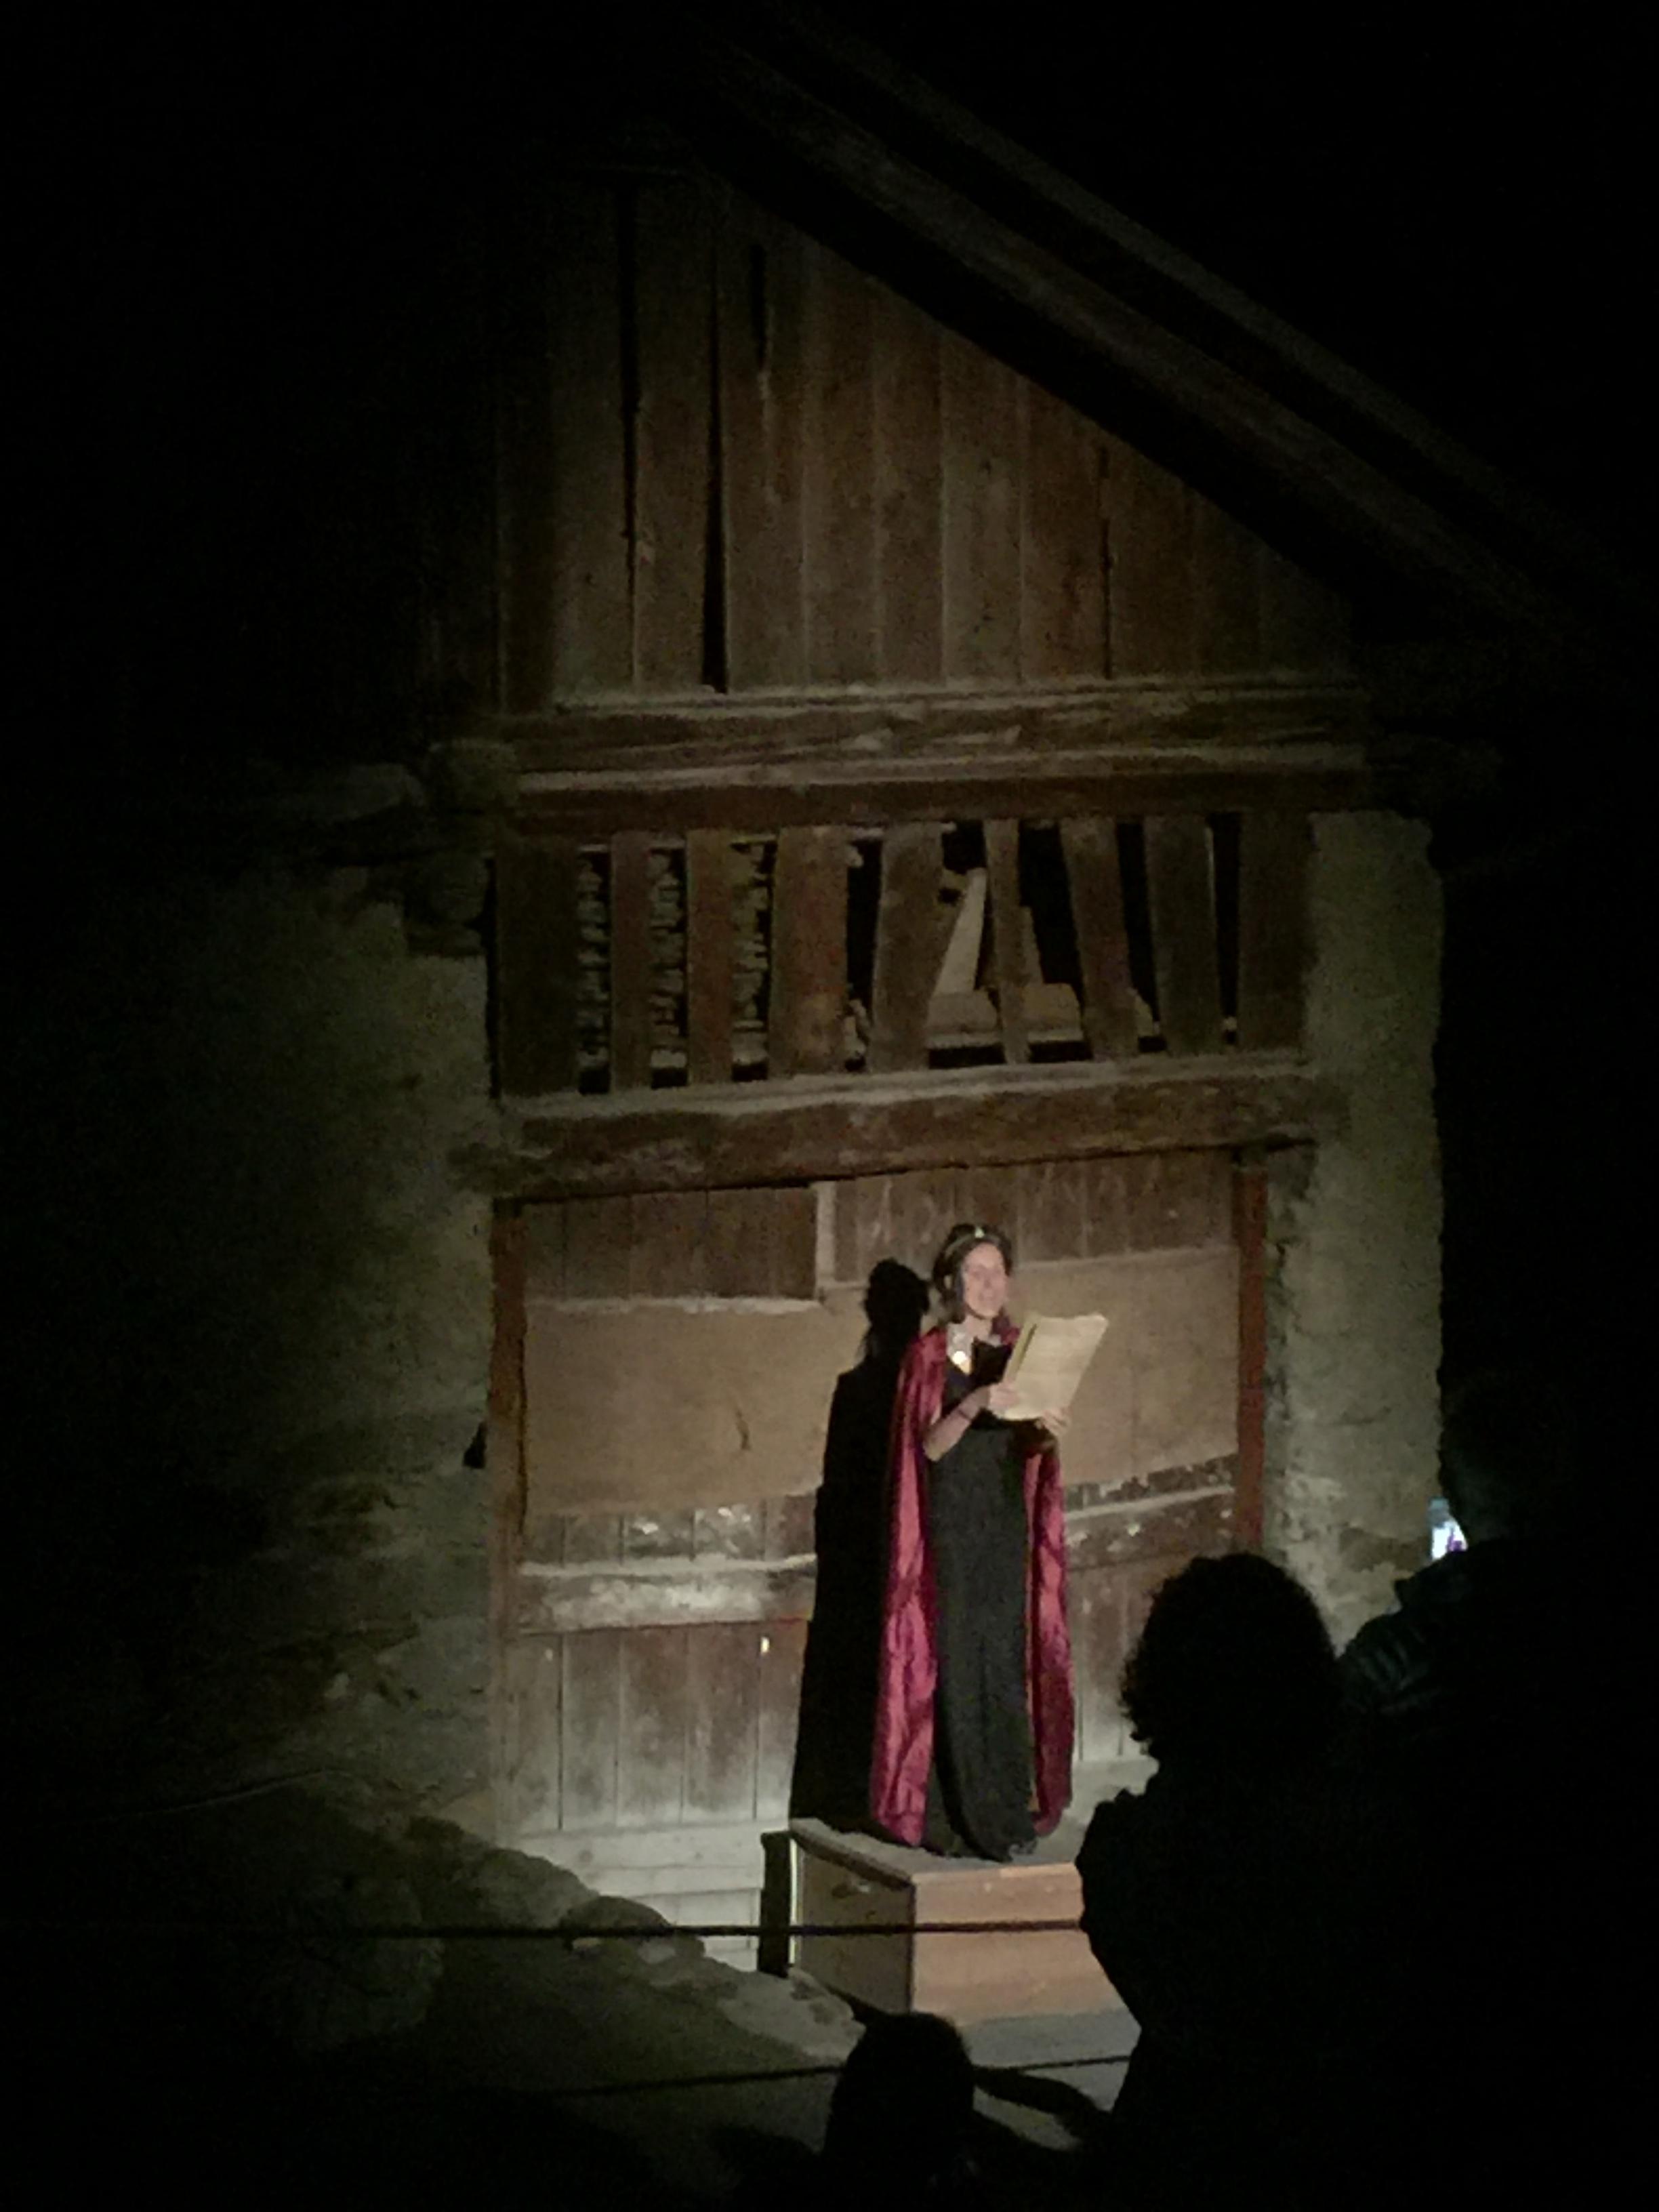 Outdoor theater Vermiglio, Italy